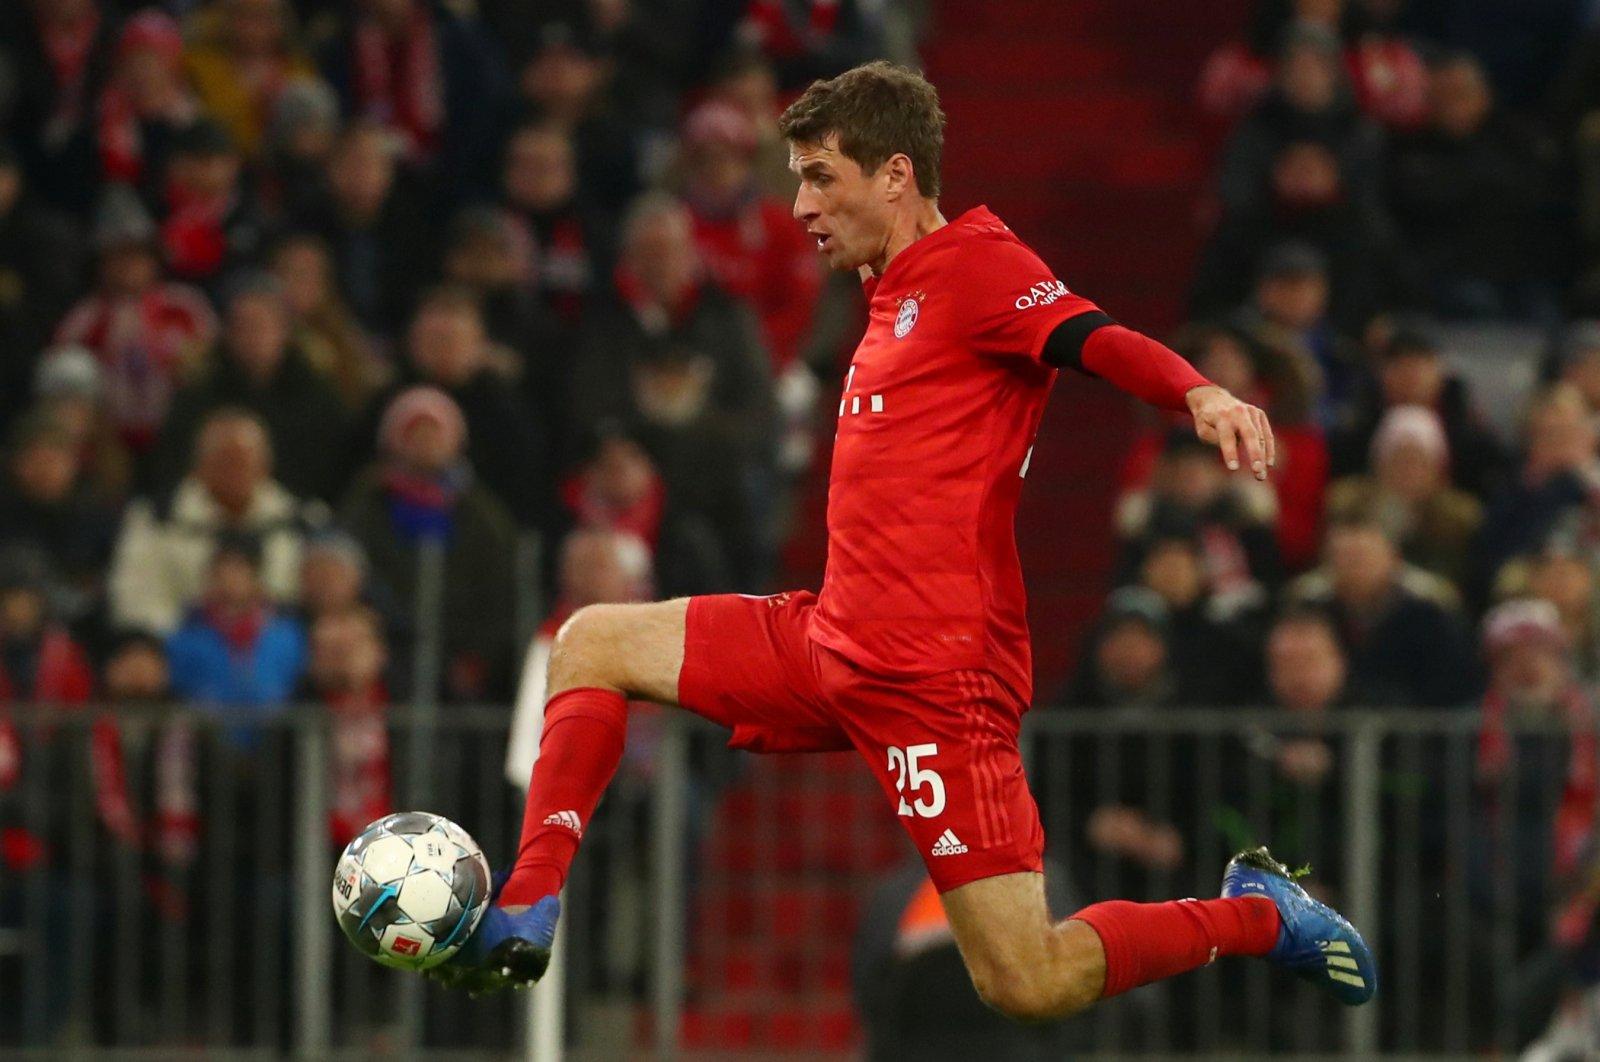 Bayern Munich's Thomas Muller scores a goal during a Bundesliga match against Schalke, in Munich, Germany, Jan. 25, 2020. (Reuters Photo)